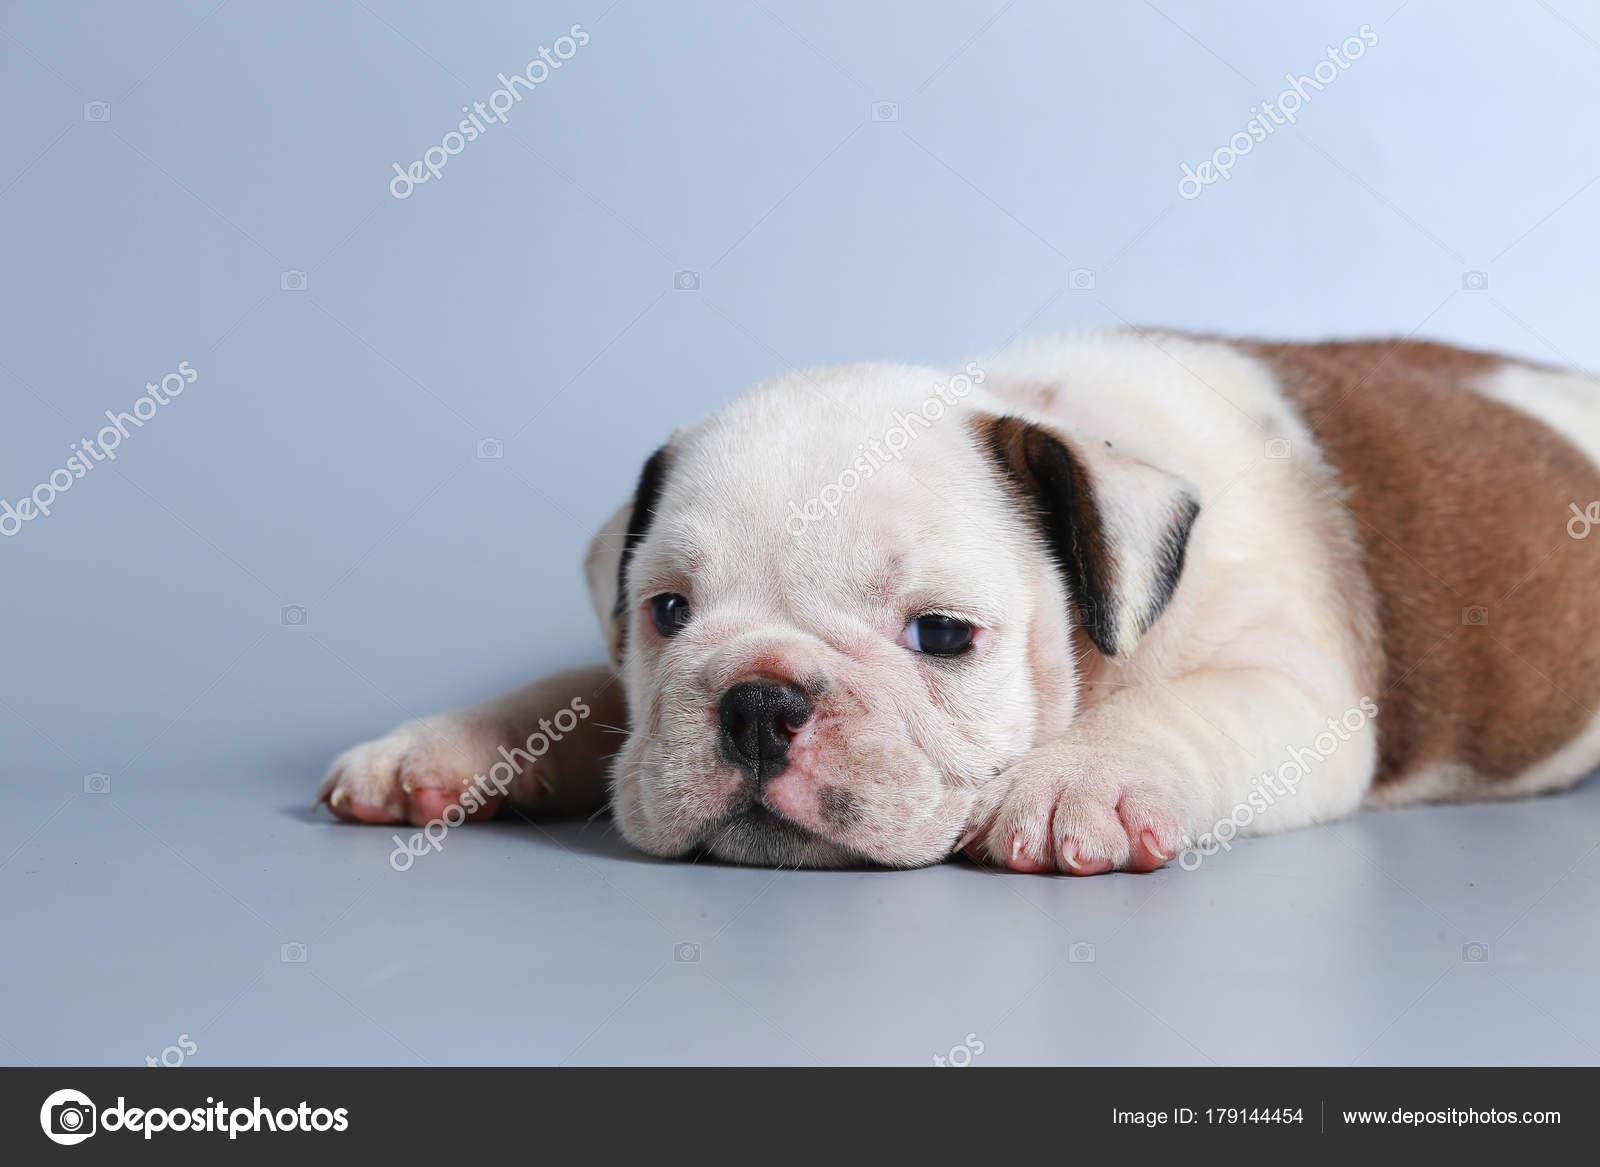 Month Purebred English Bulldog Puppy Gray Screen Stock Photo C S Thanawathreborn Gmail Com 179144454